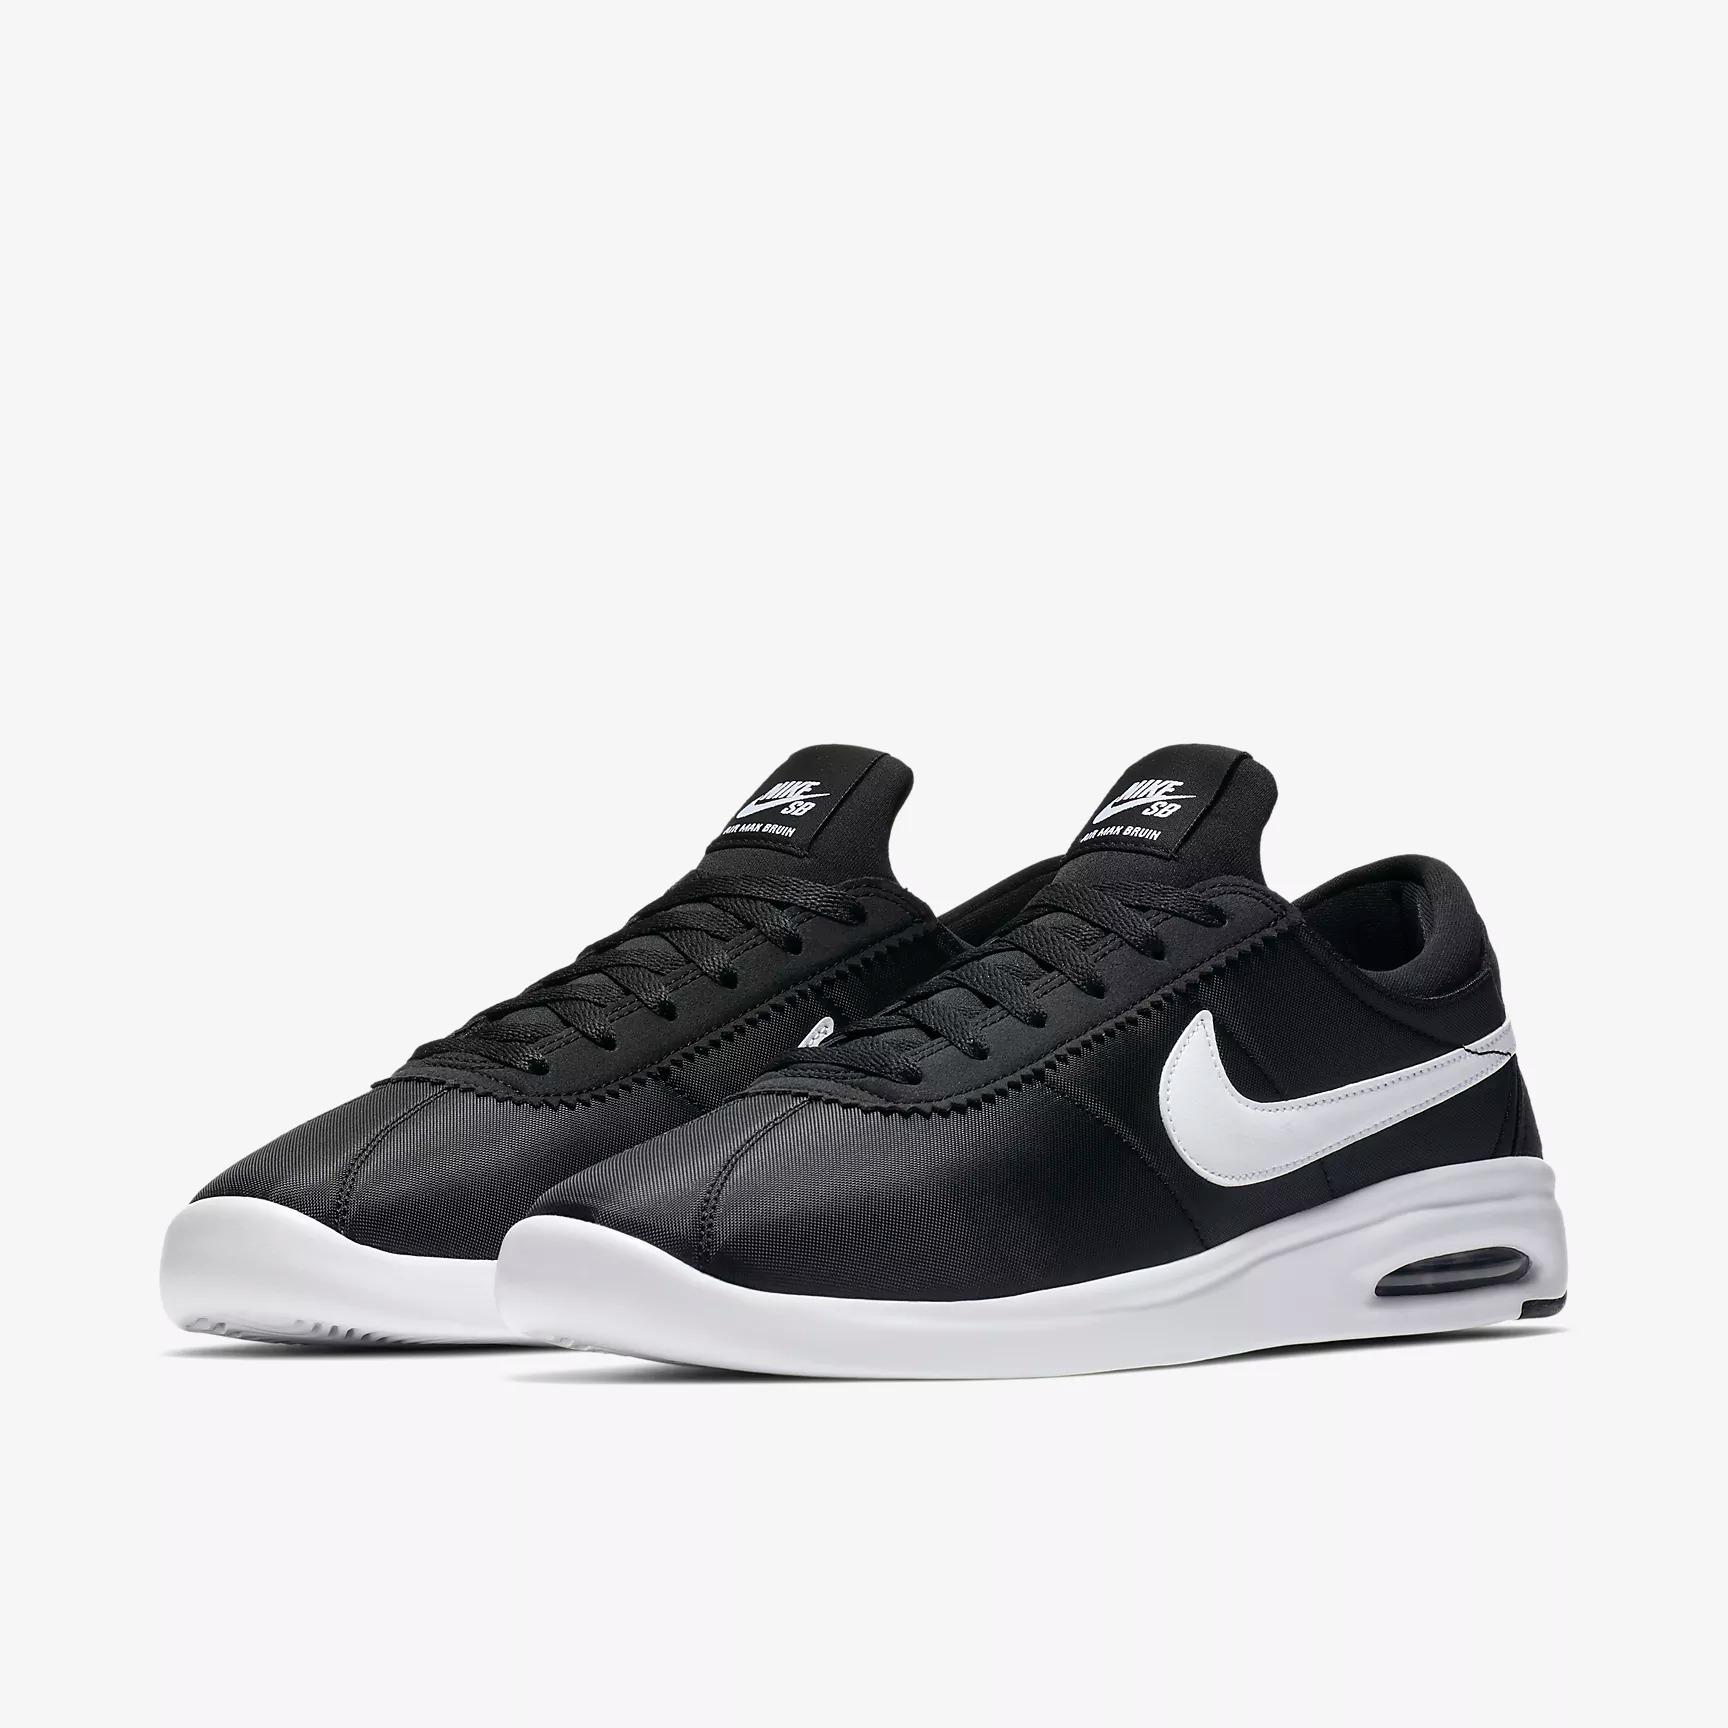 76e0381b205 Nike SB Air Max Bruin Vapor TXT Sneakers - SPORT SHOES Lifestyle Shoes